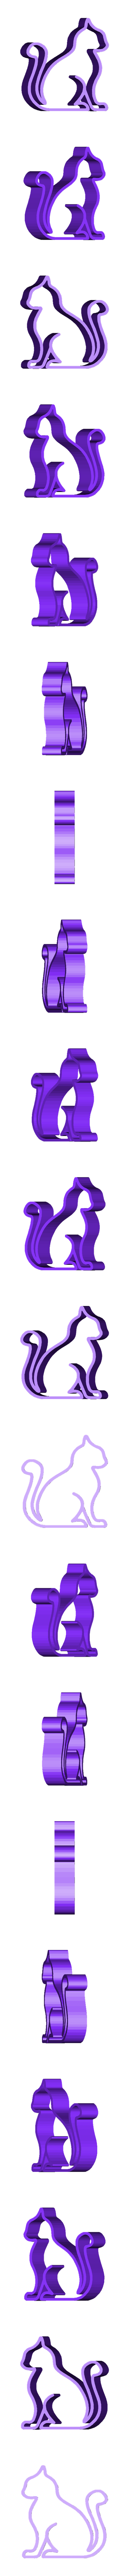 Gato.stl Download free STL file Cake and Biscuit Moulds • 3D printer design, Zero13